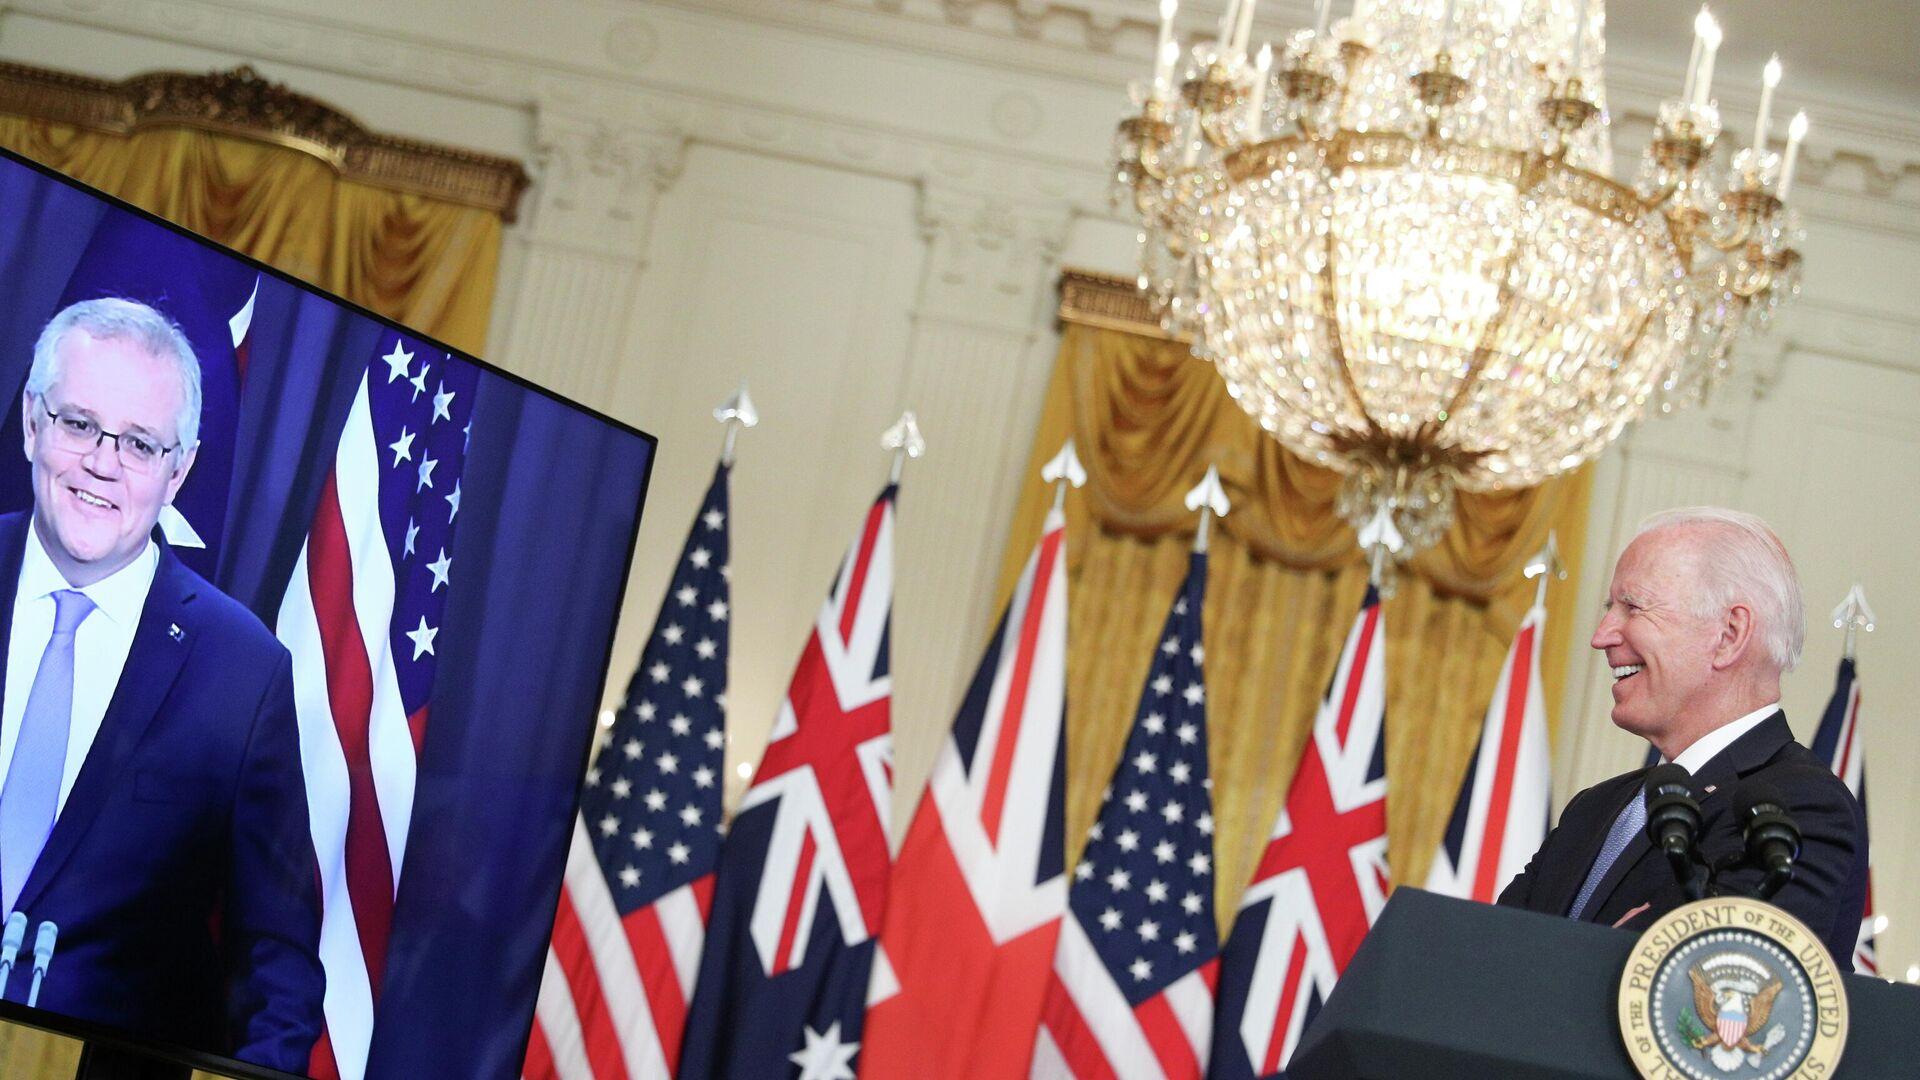 President Biden delivers remark on National Security at the White House  - Sputnik International, 1920, 24.09.2021